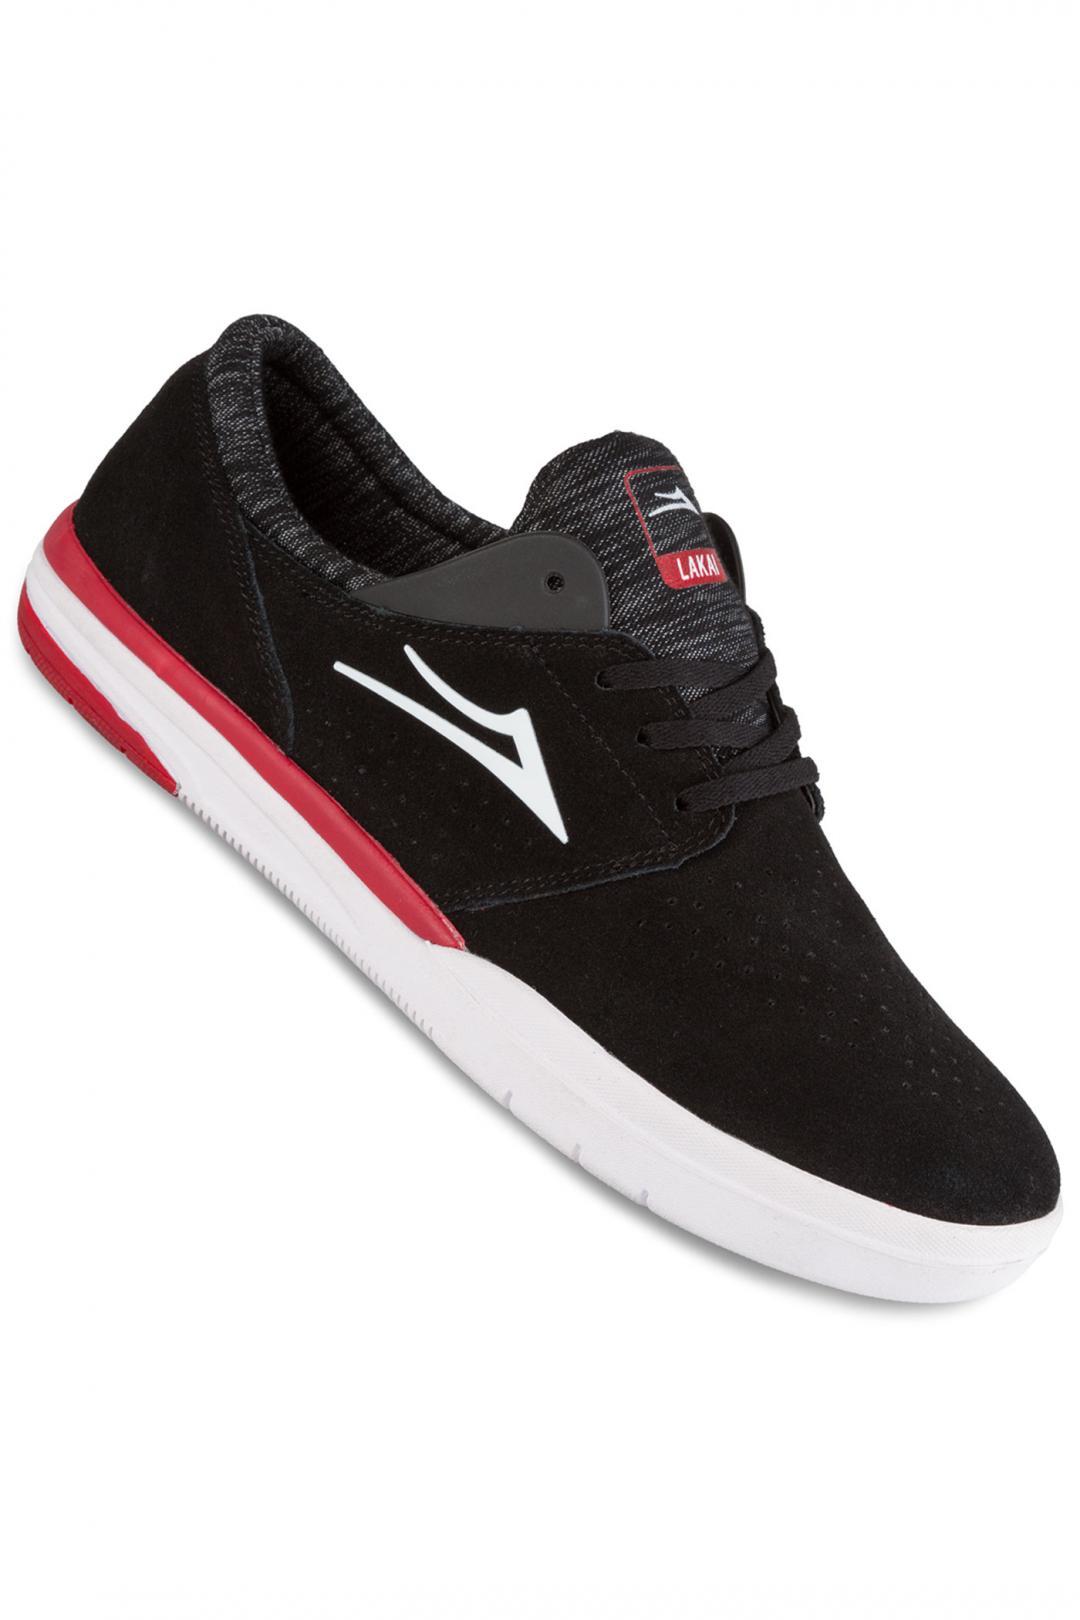 Uomo Lakai Fremont Suede black   Sneaker